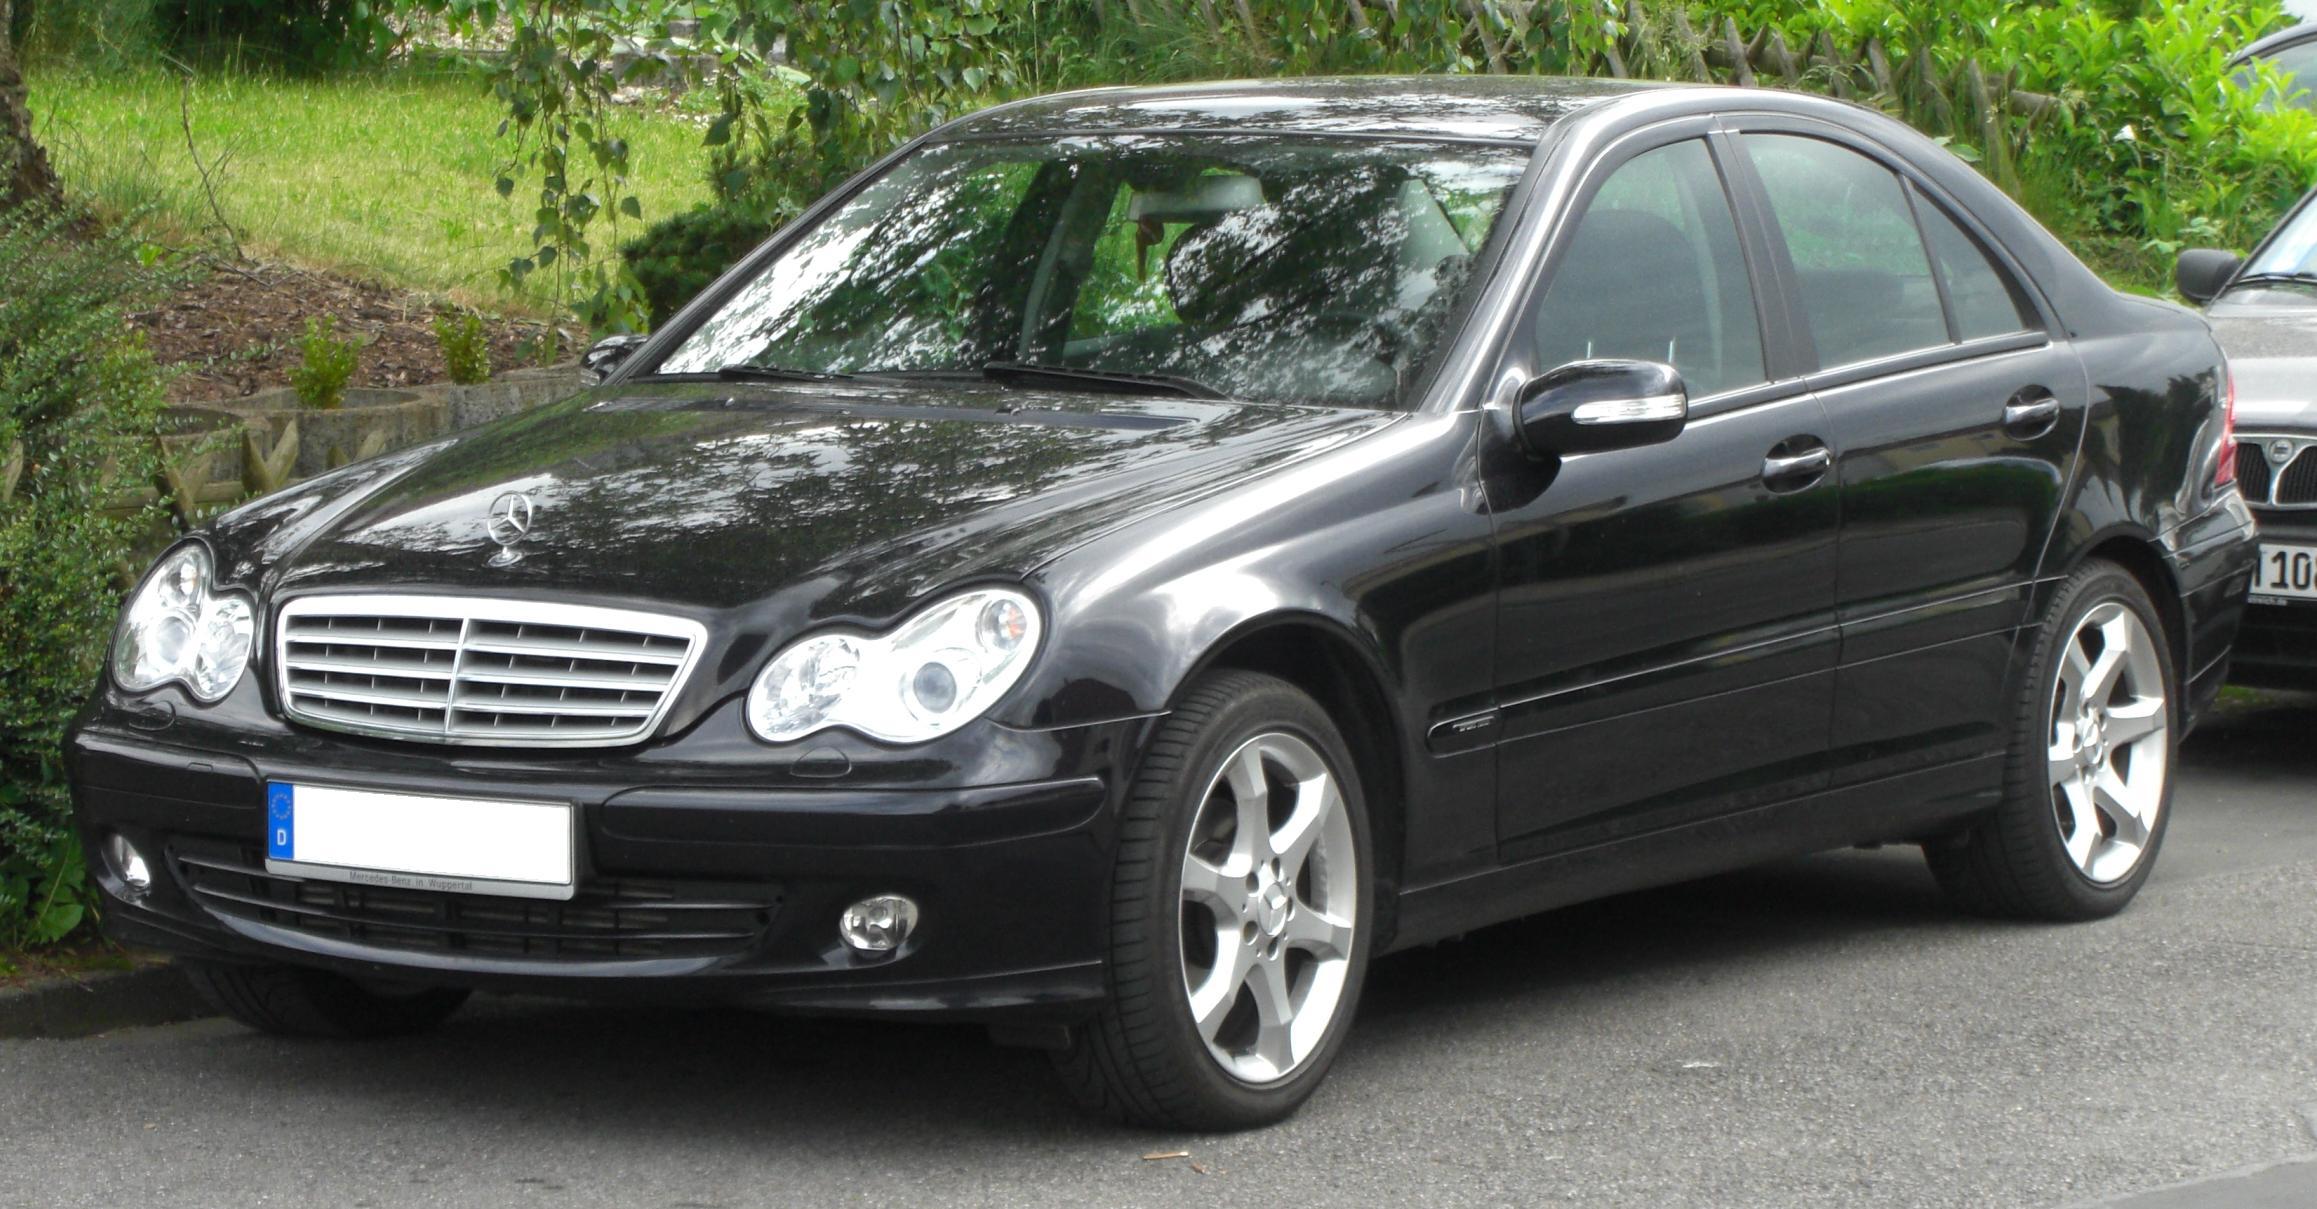 Mercedes_C-Klasse_(W203)_Sport_Edition_front.jpg